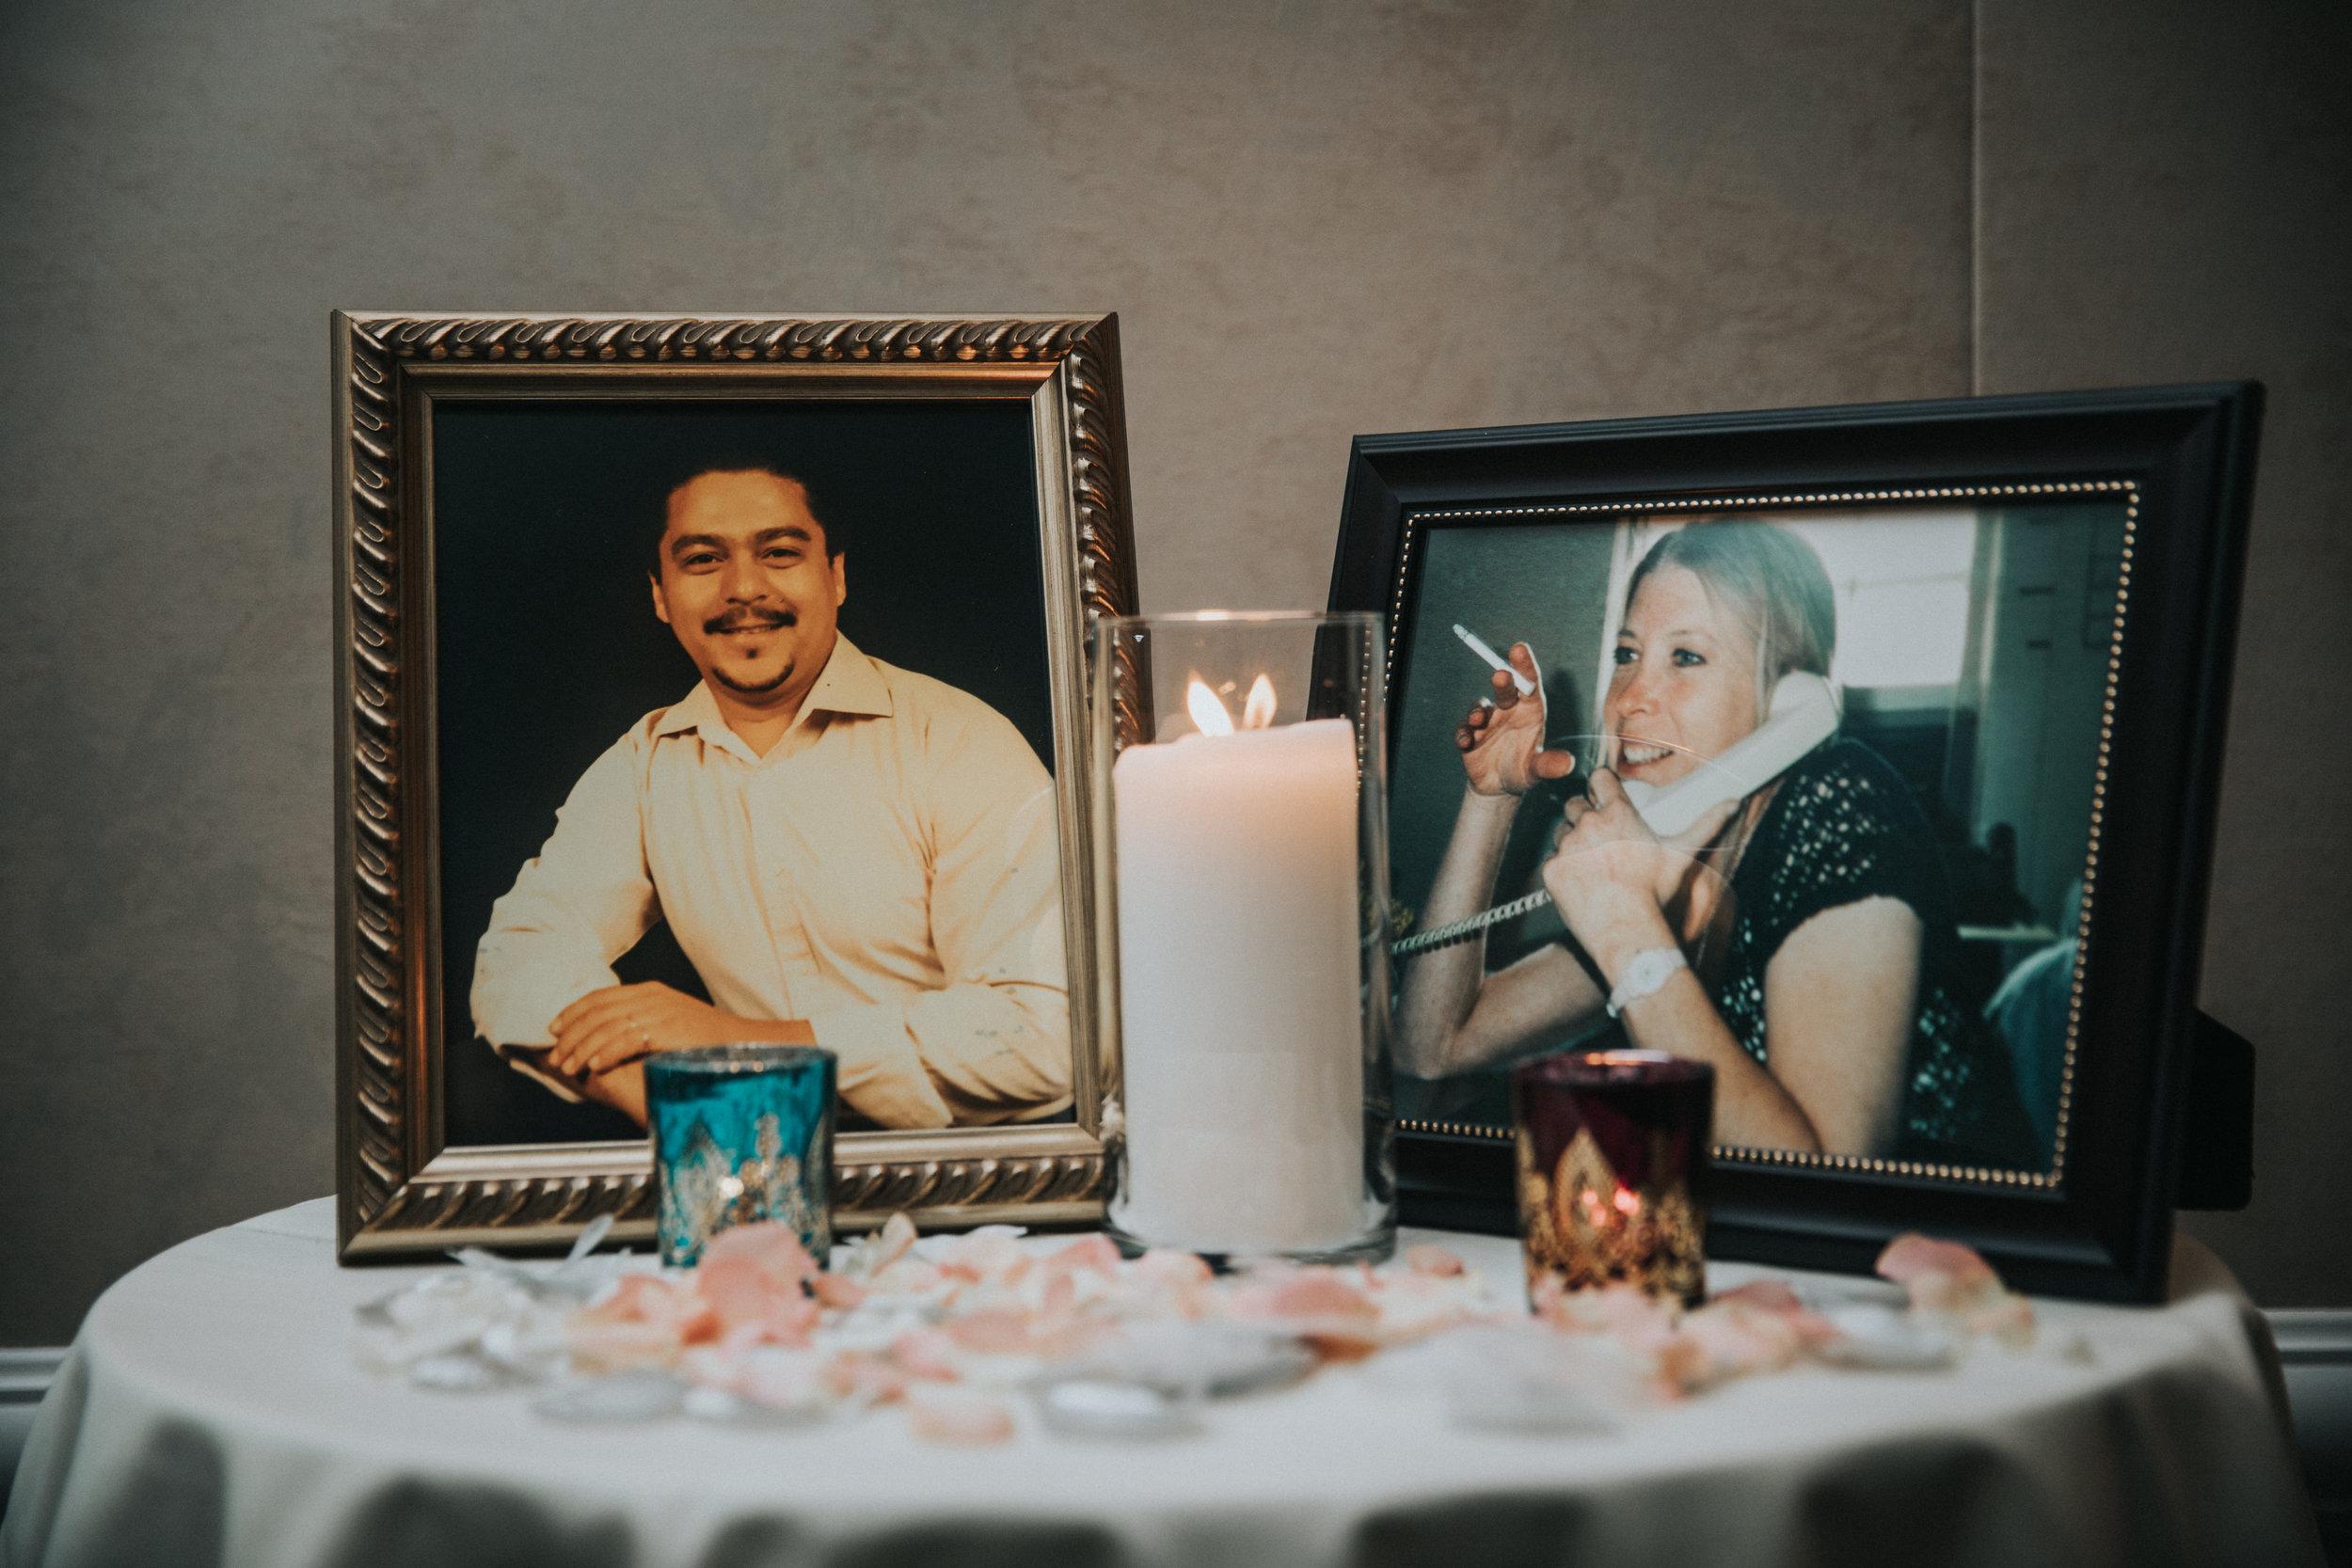 New-Jersey-Wedding-Photographer-ReceptionCenter-Valeria&Mike-Venue_Details (10 of 21).jpg